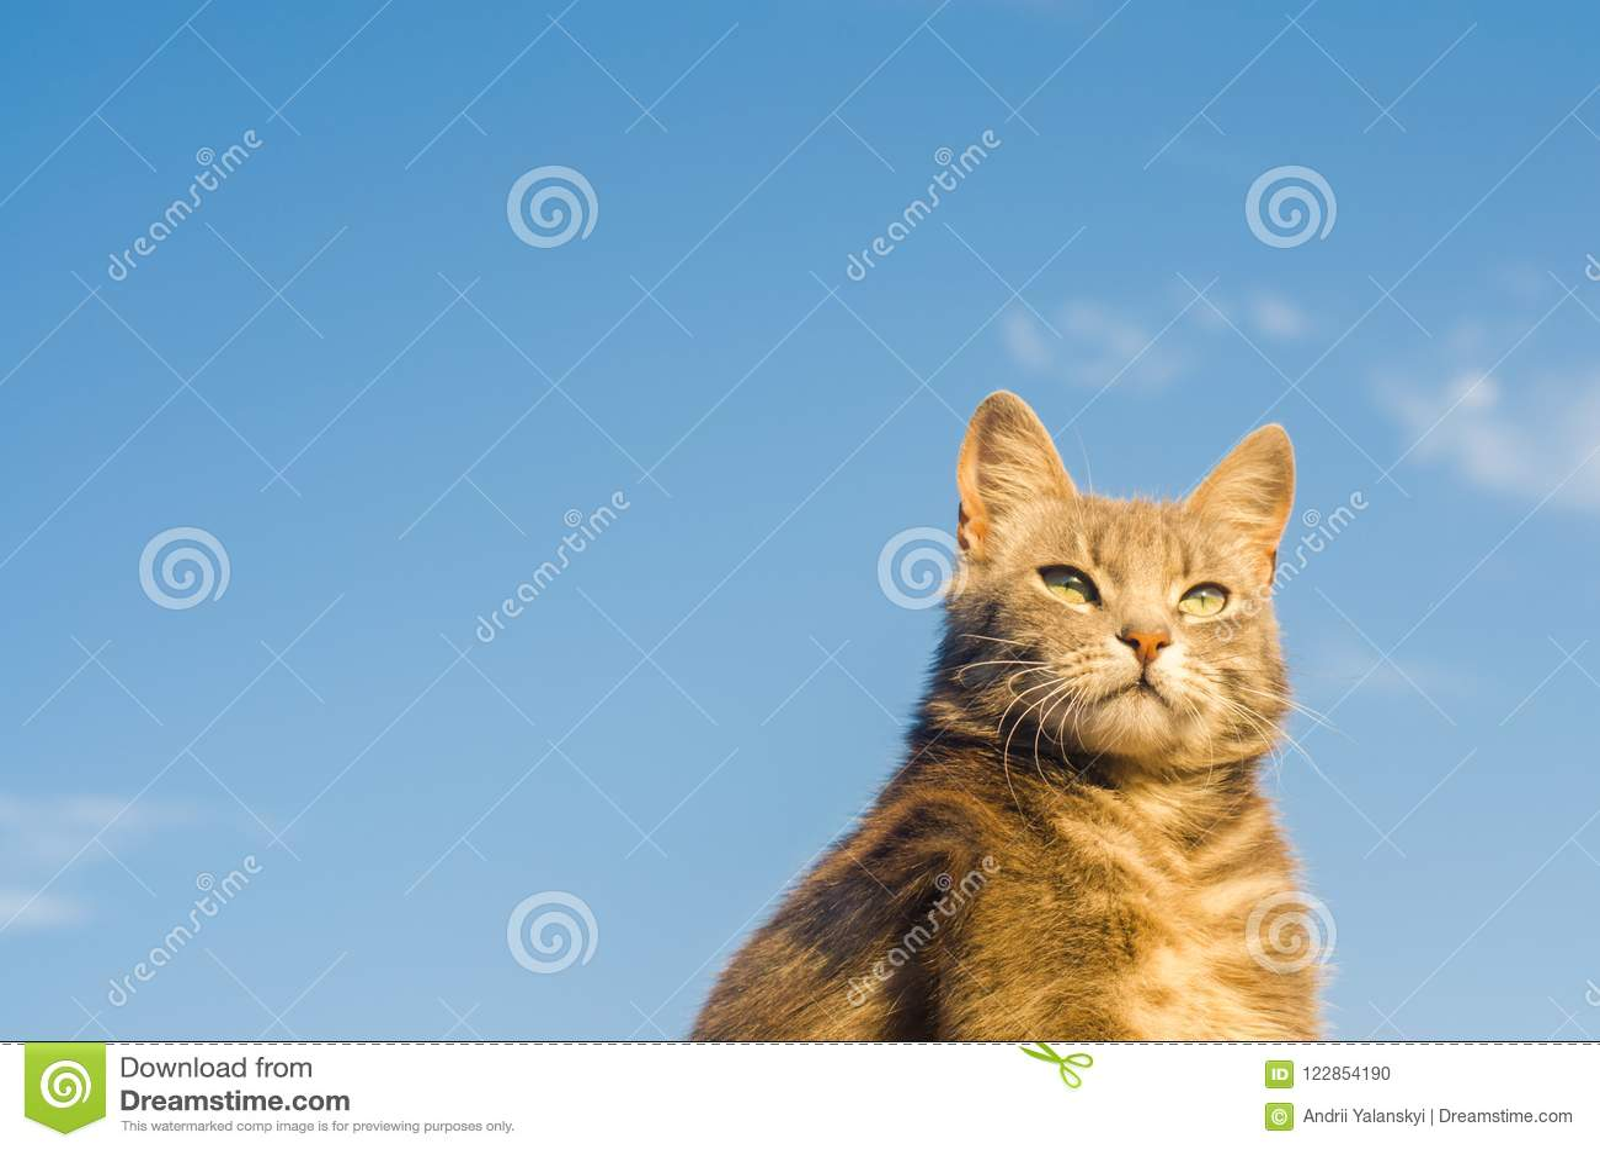 un gatto nel blu lyrics